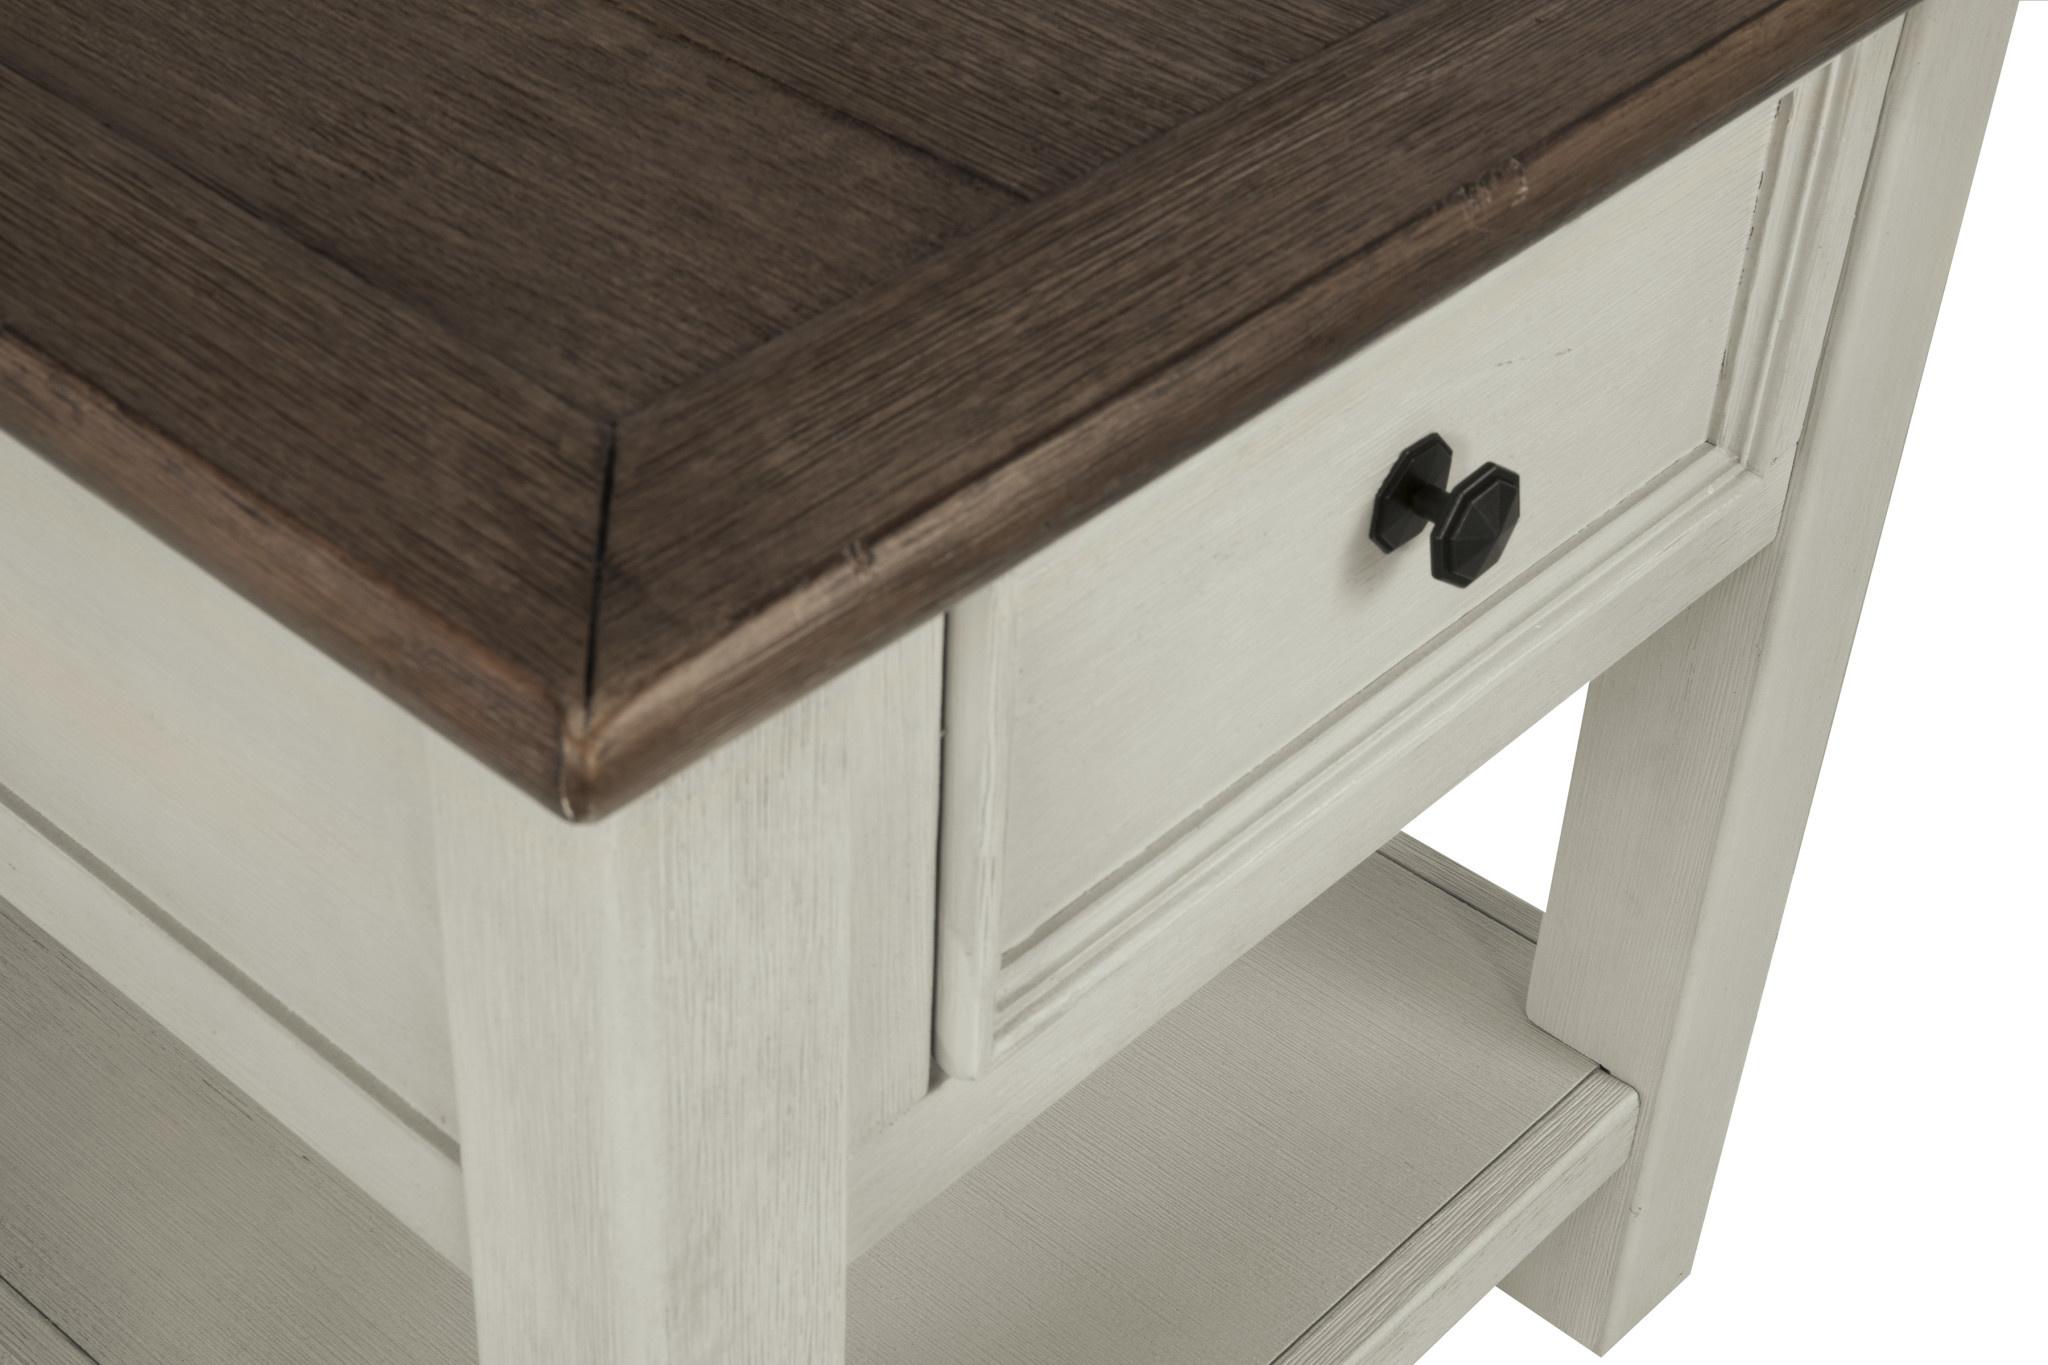 Signature Design Bolanburg Square End Table T637-3